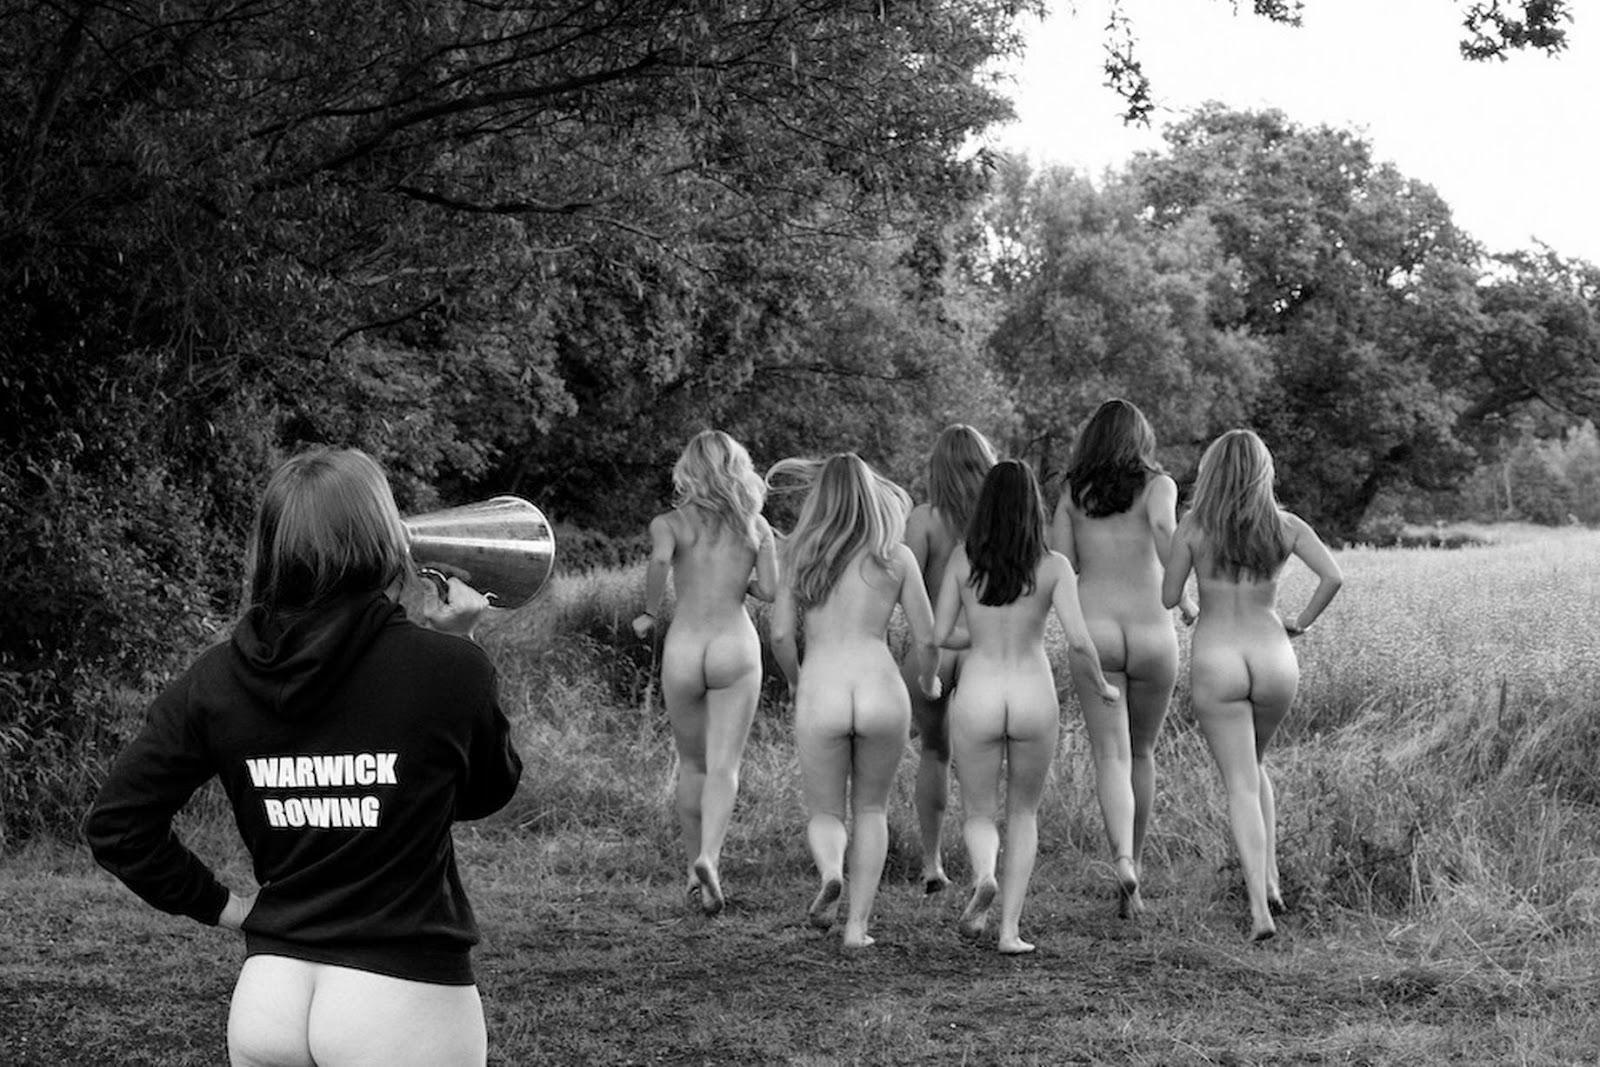 Девушки комсомолки на эротических фотографиях 13